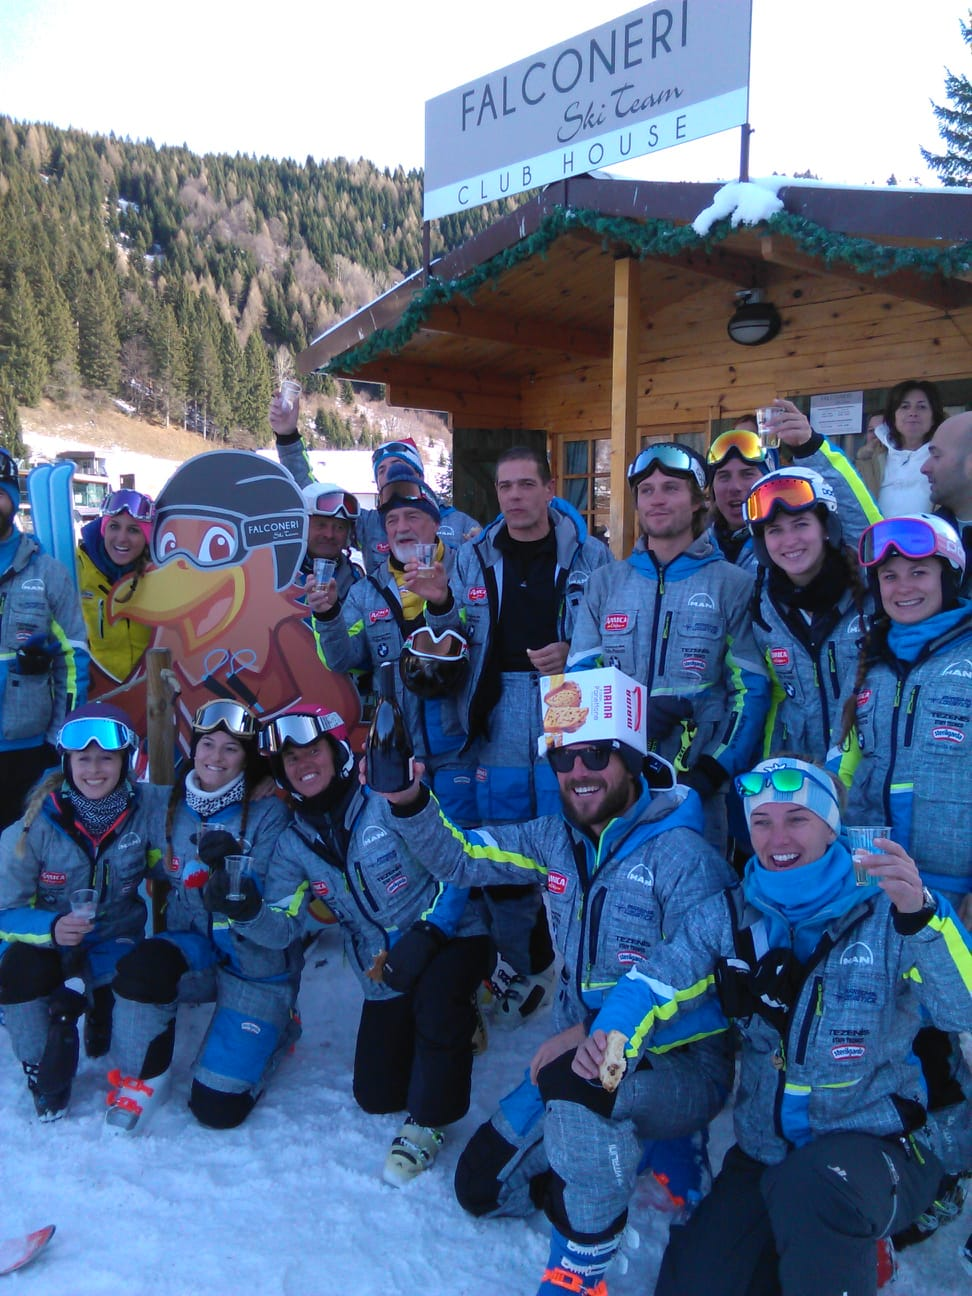 Auguri dallo Staff Falconeri Ski Team